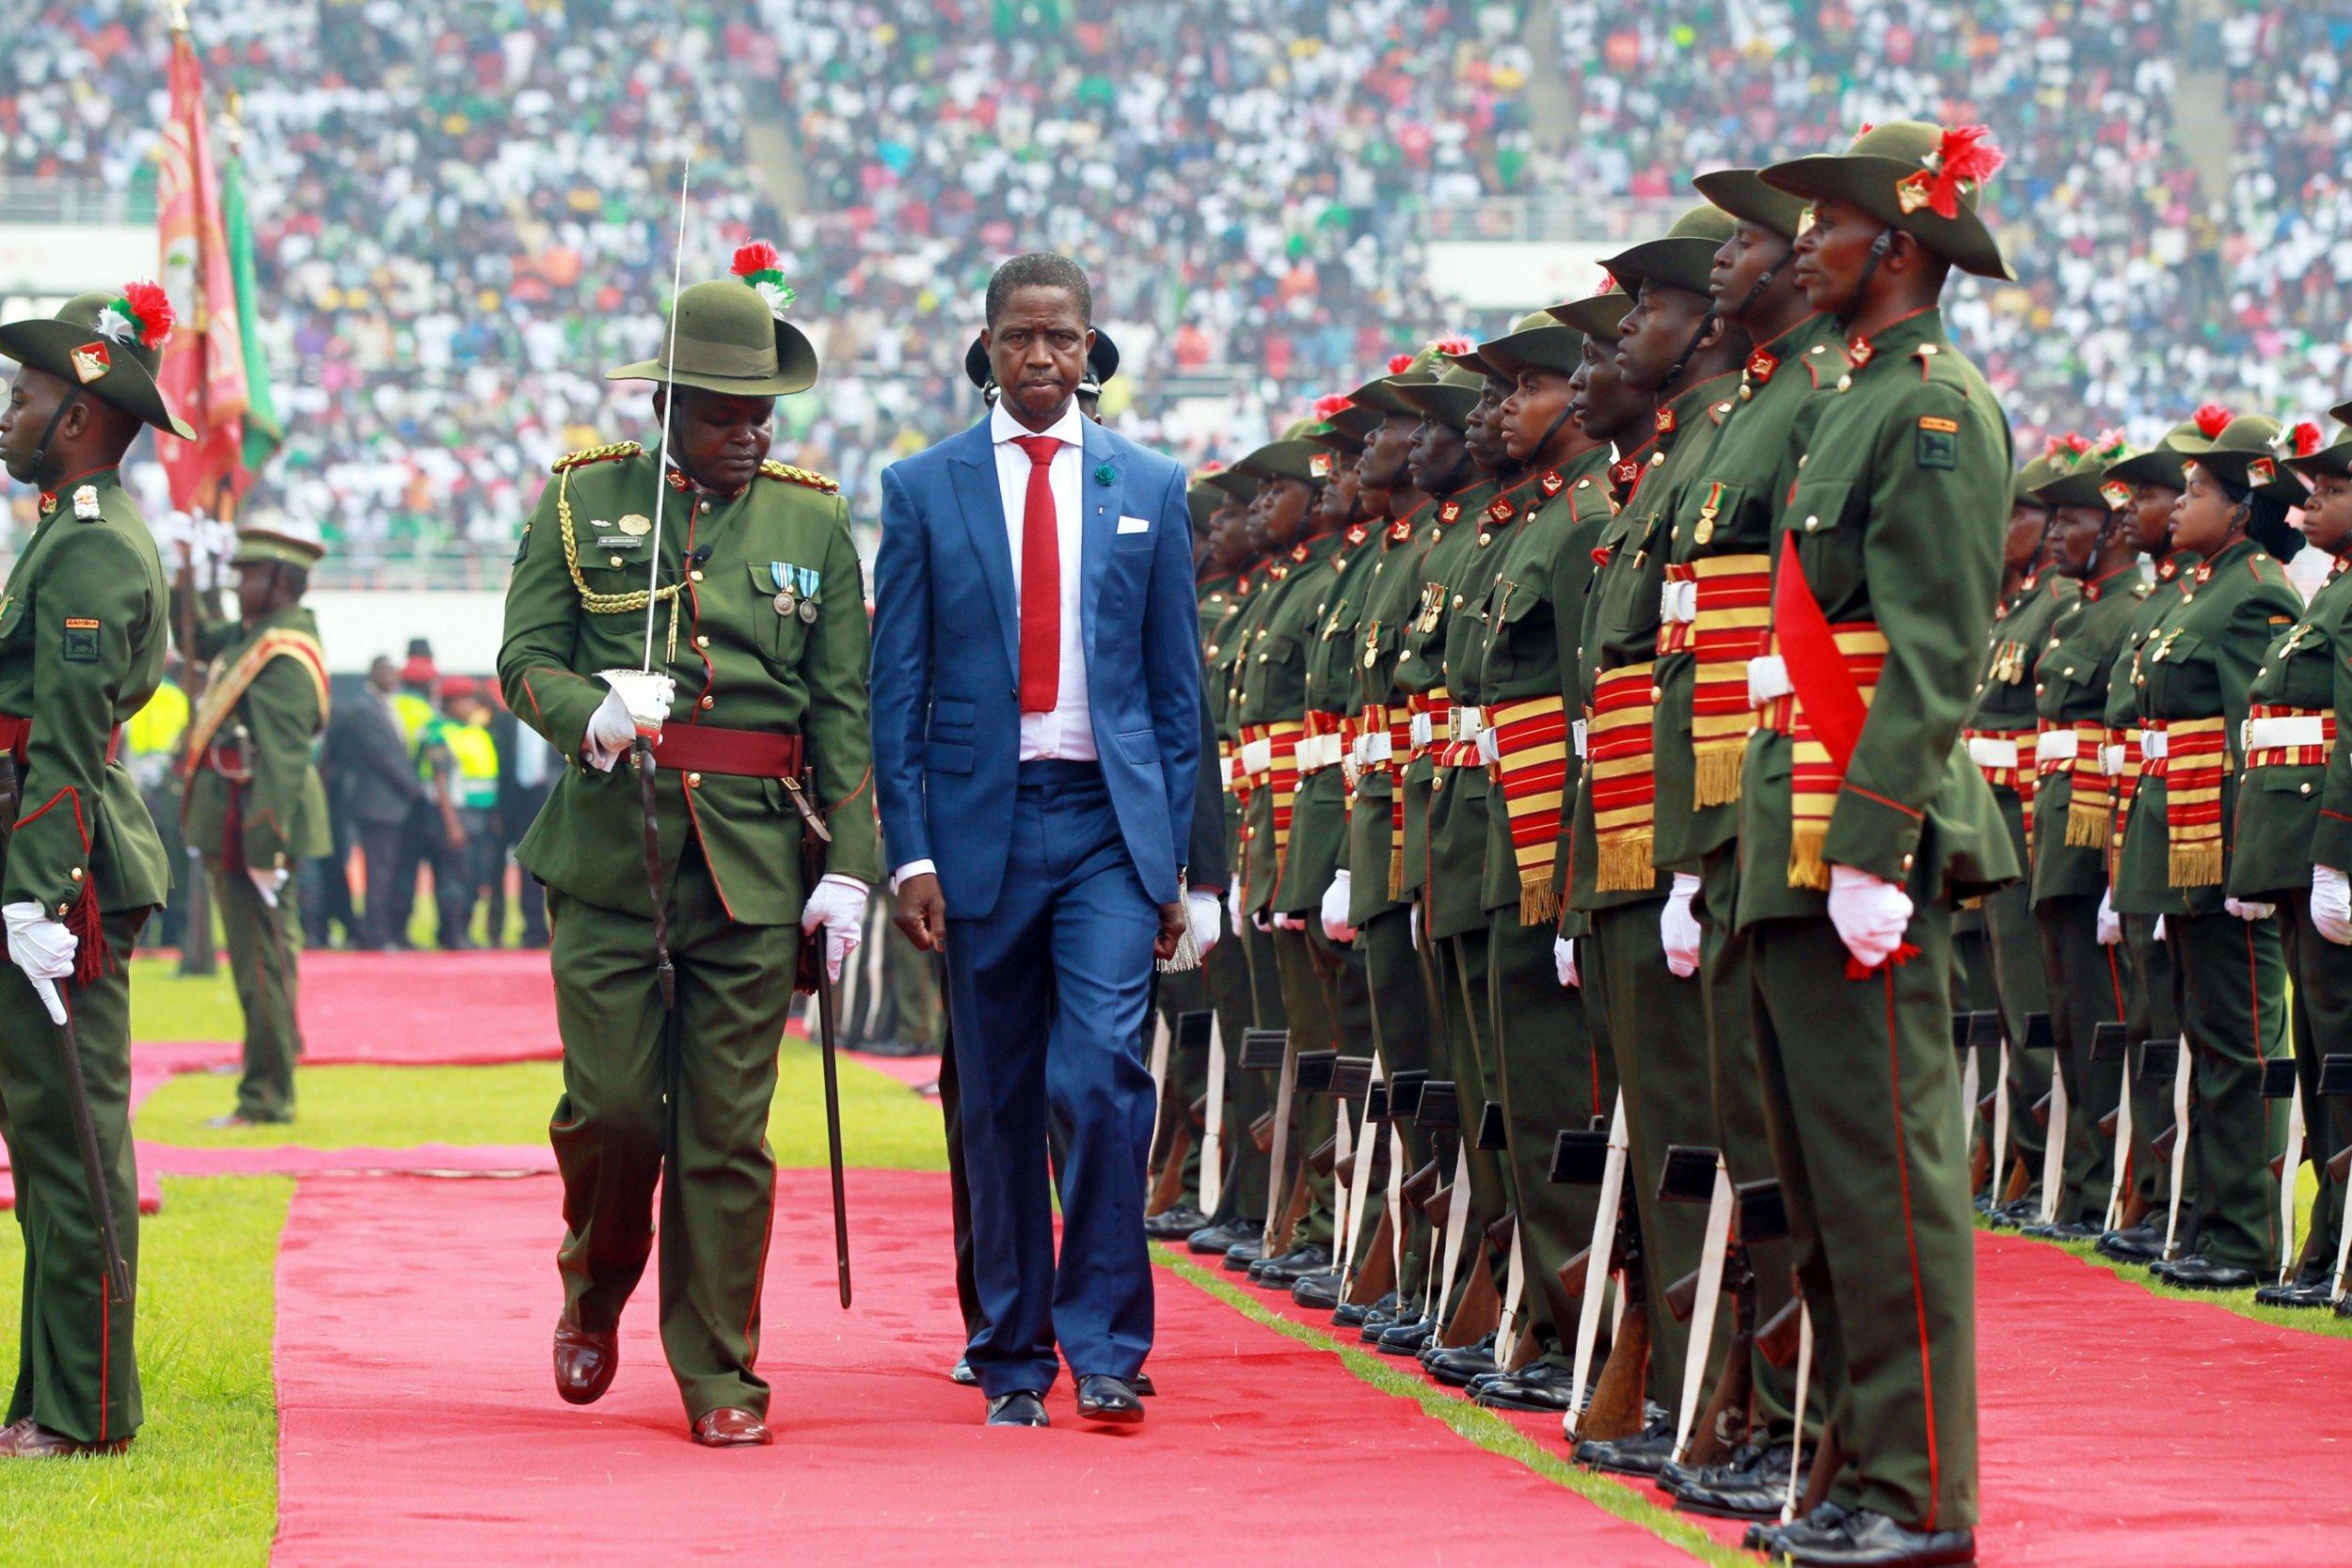 Zambia's Presidential Election Winner Is President Edgar Lungu